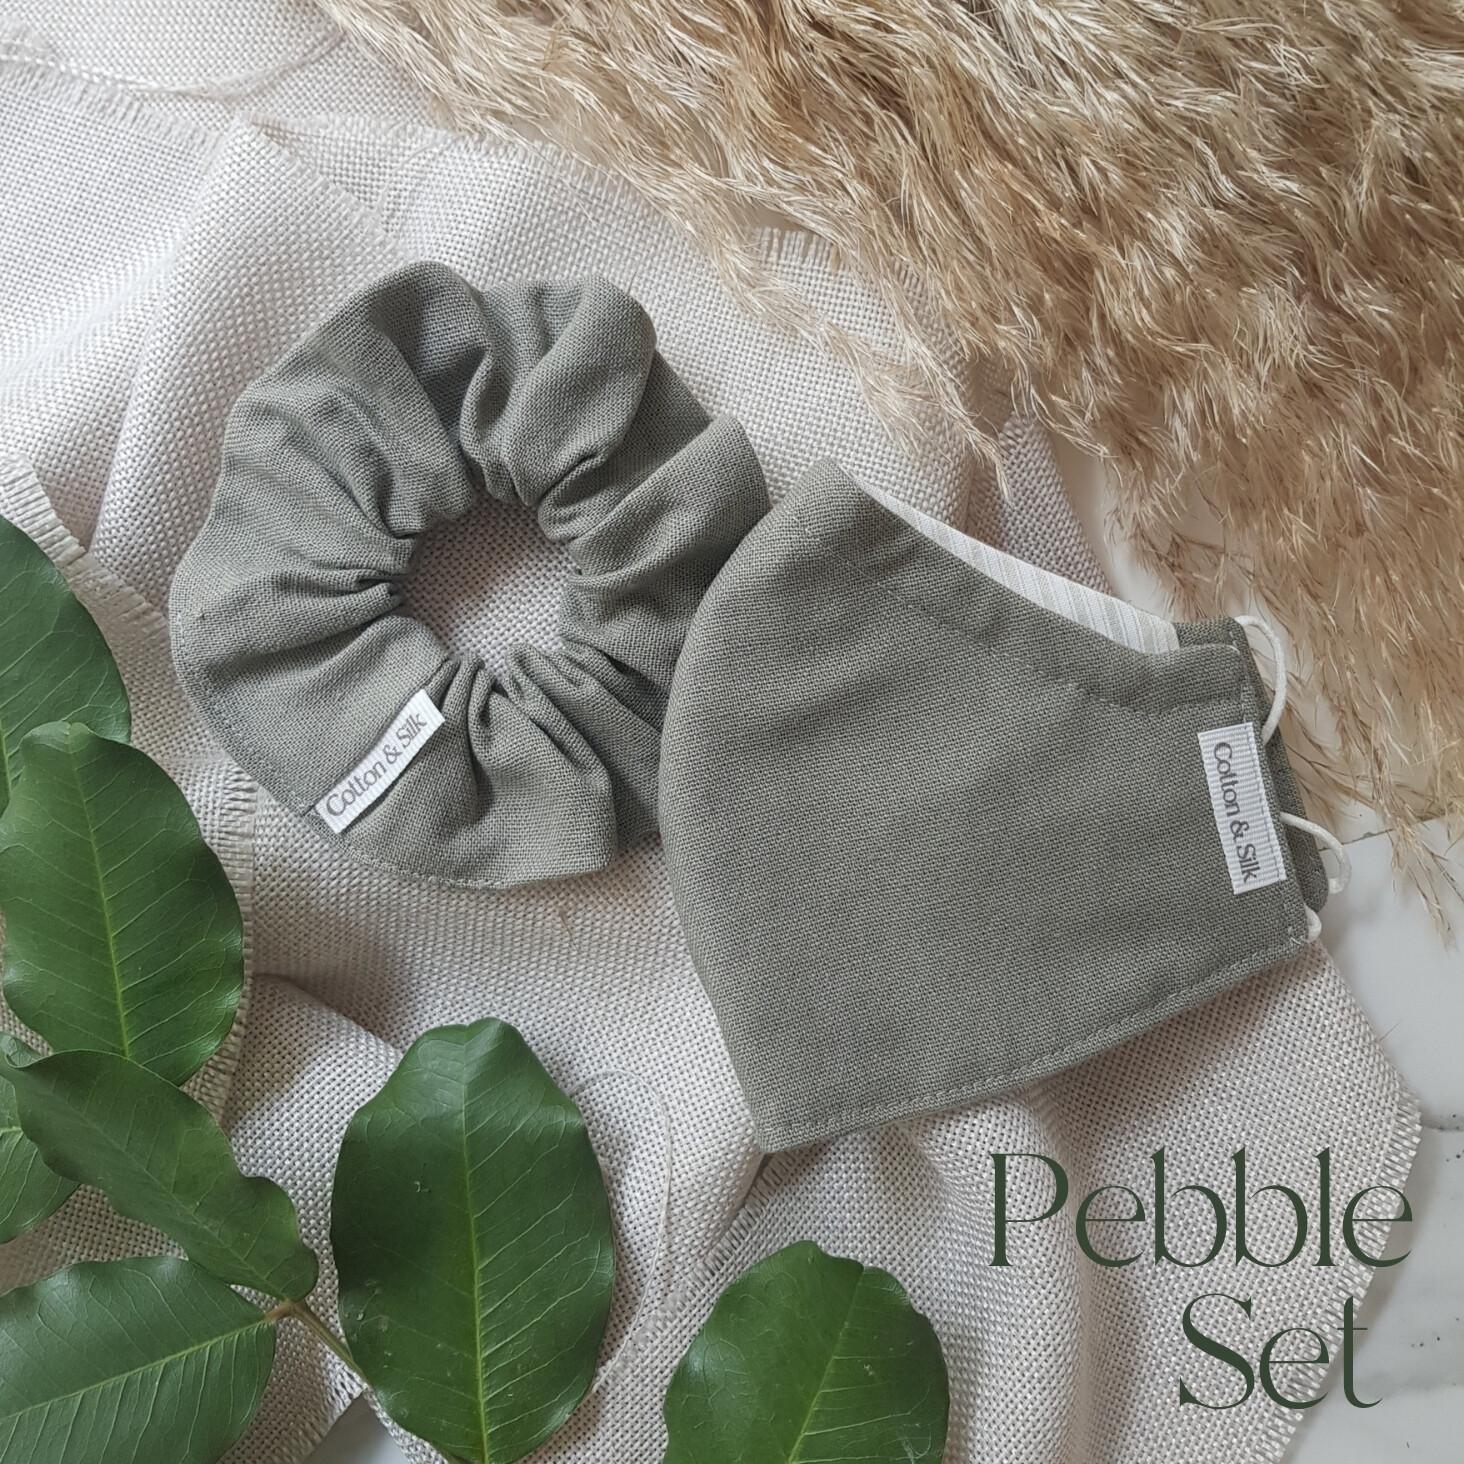 Ladies Mask & Scrunchie Set (Linen Rayon) - Pebble